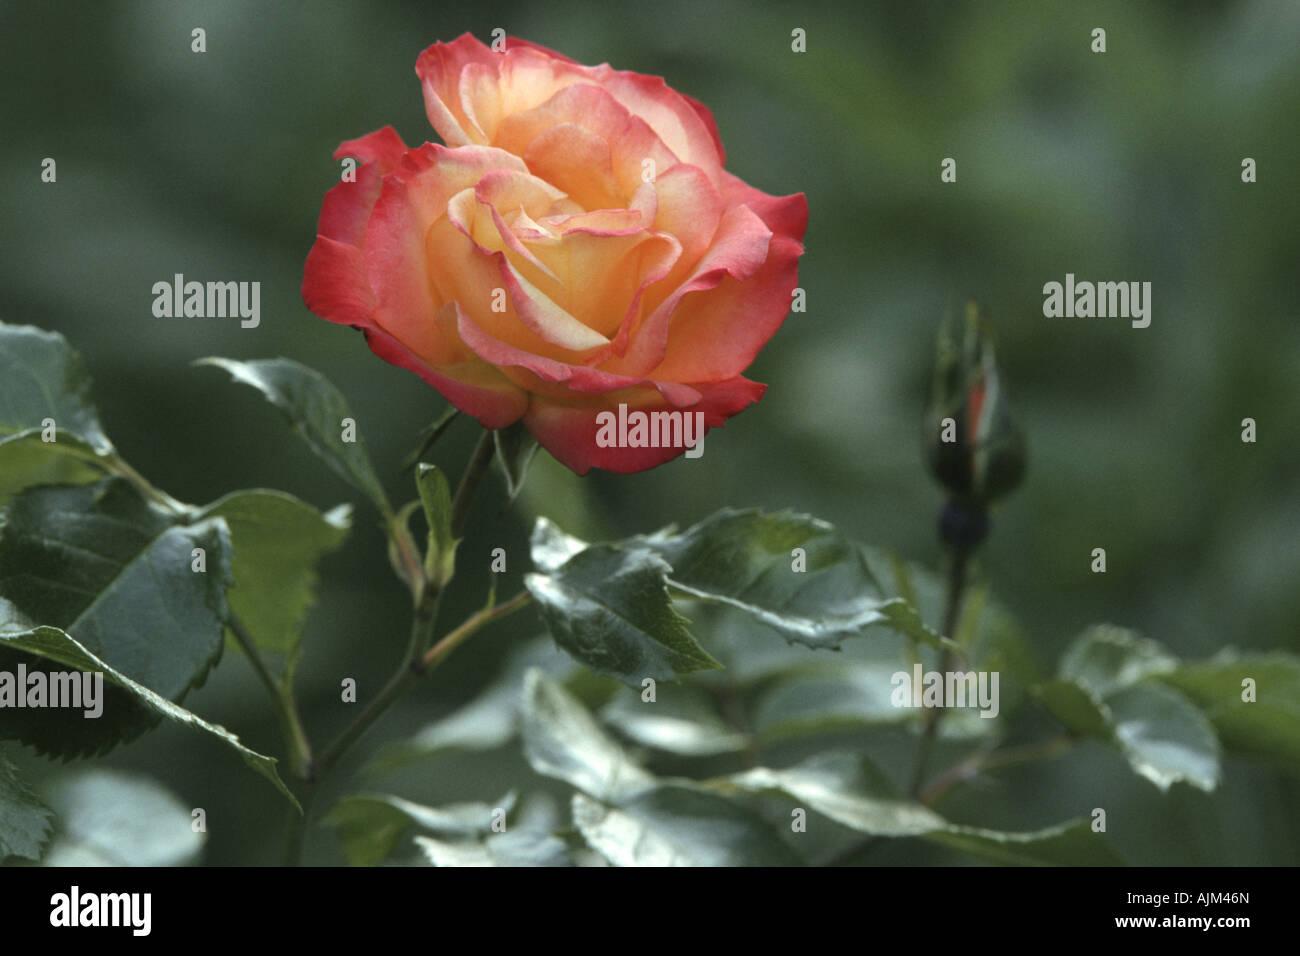 ornamental rose (Rosa 'Bonanza', Rosa Bonanza), flowers Stock Photo